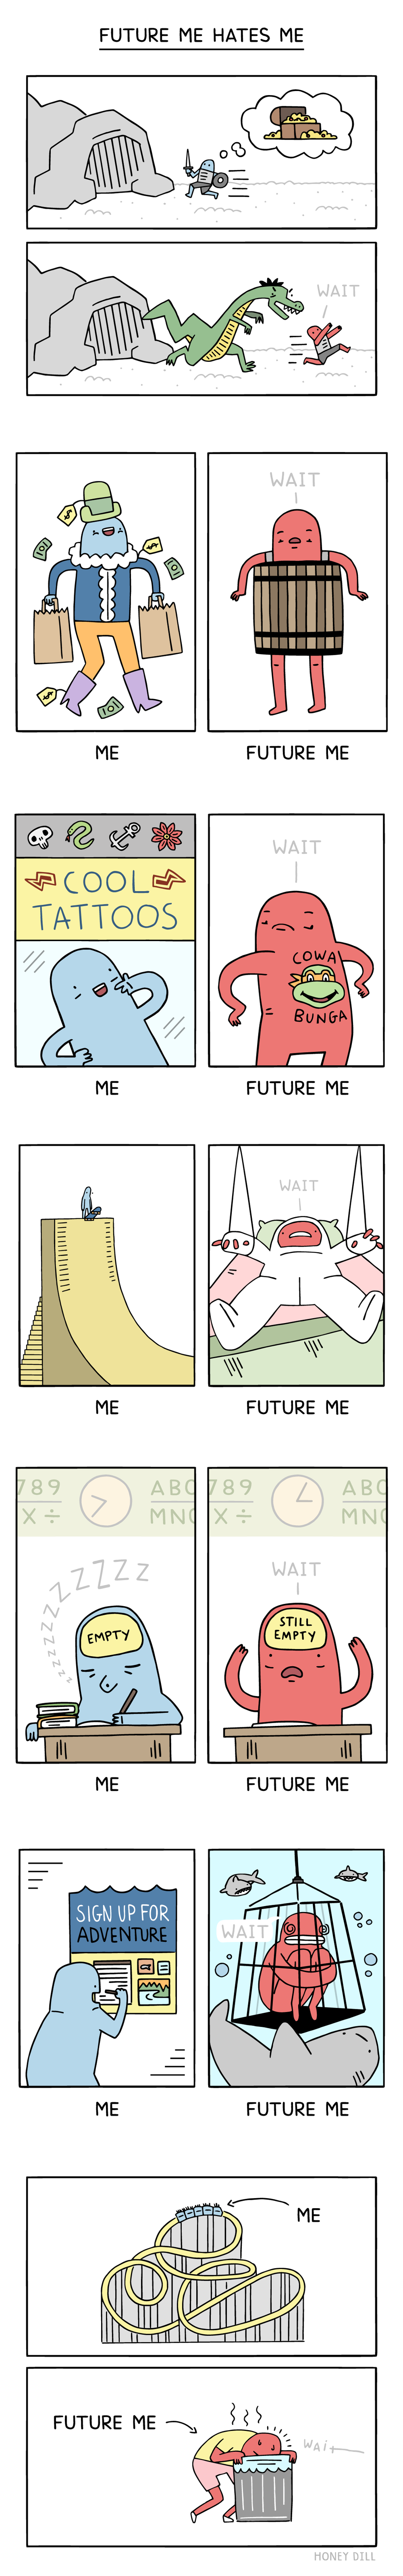 futureme-1080.png